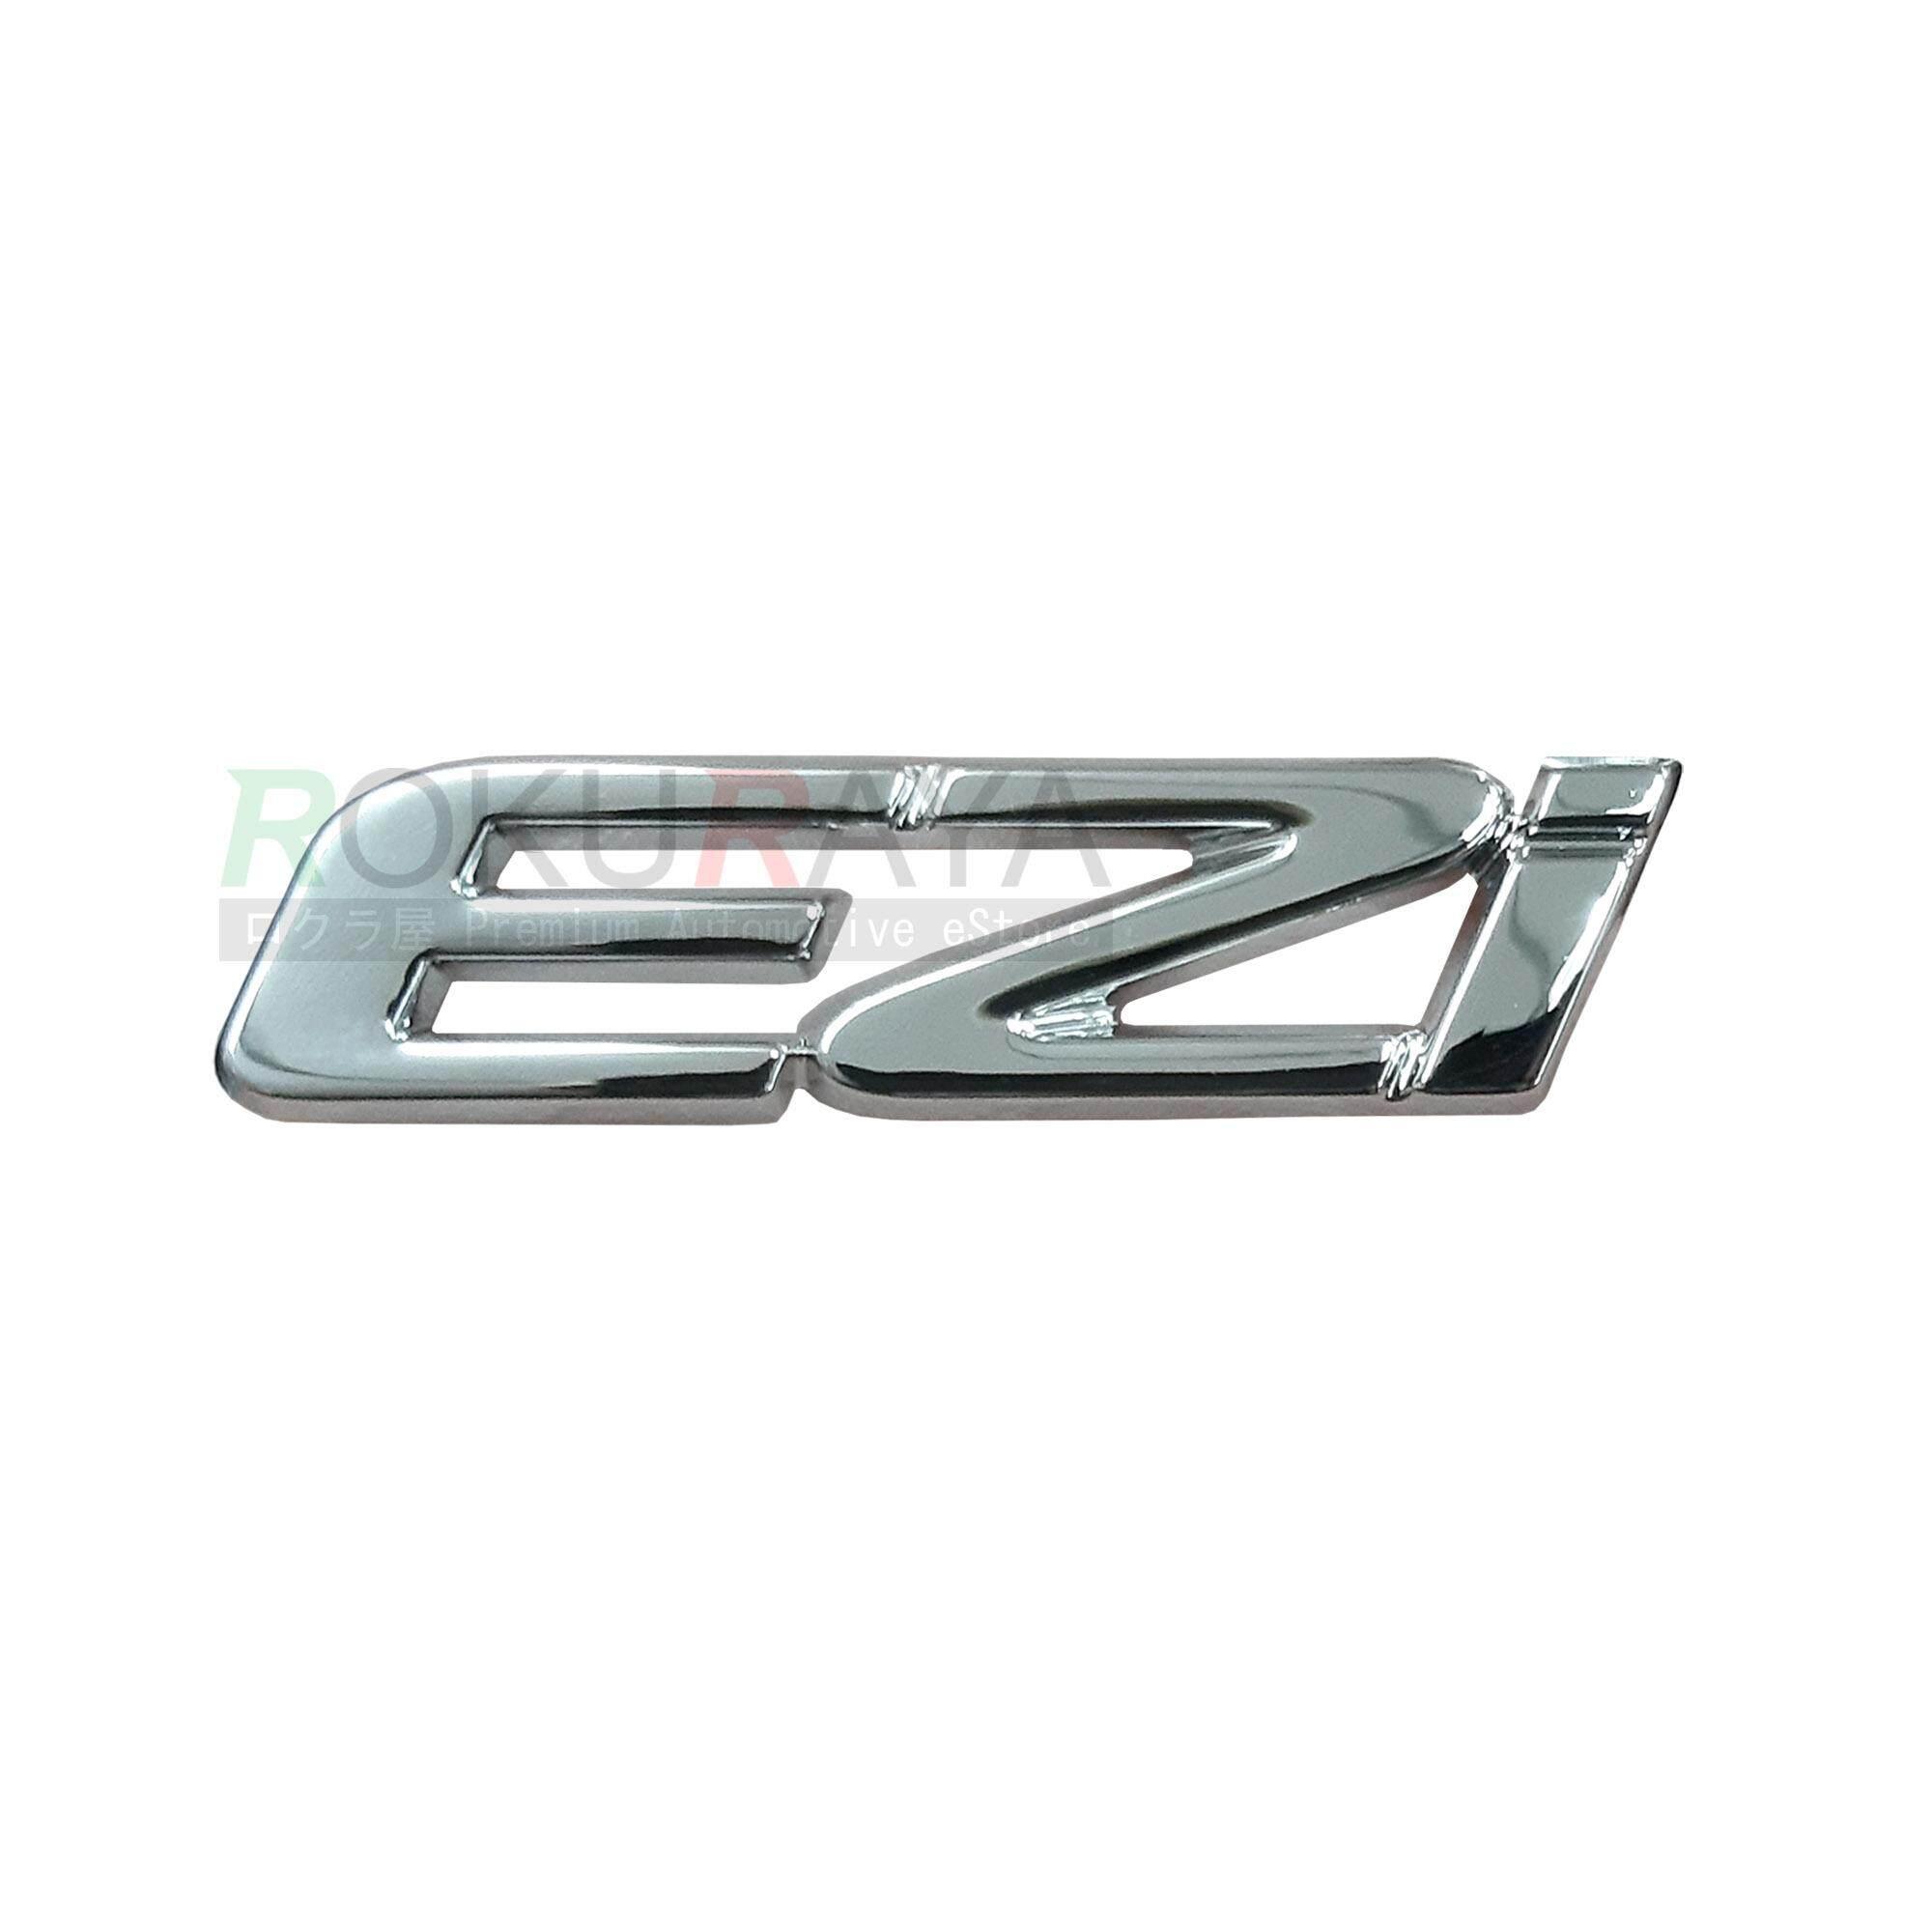 Perodua New Myvi Alza Viva Axia (6cm x 1 5cm) EZI EZi Mark Aftermarket 3D  Car Rear Back Emblem Logo Badge ABS Plastic Chrome Plated Replacement Part